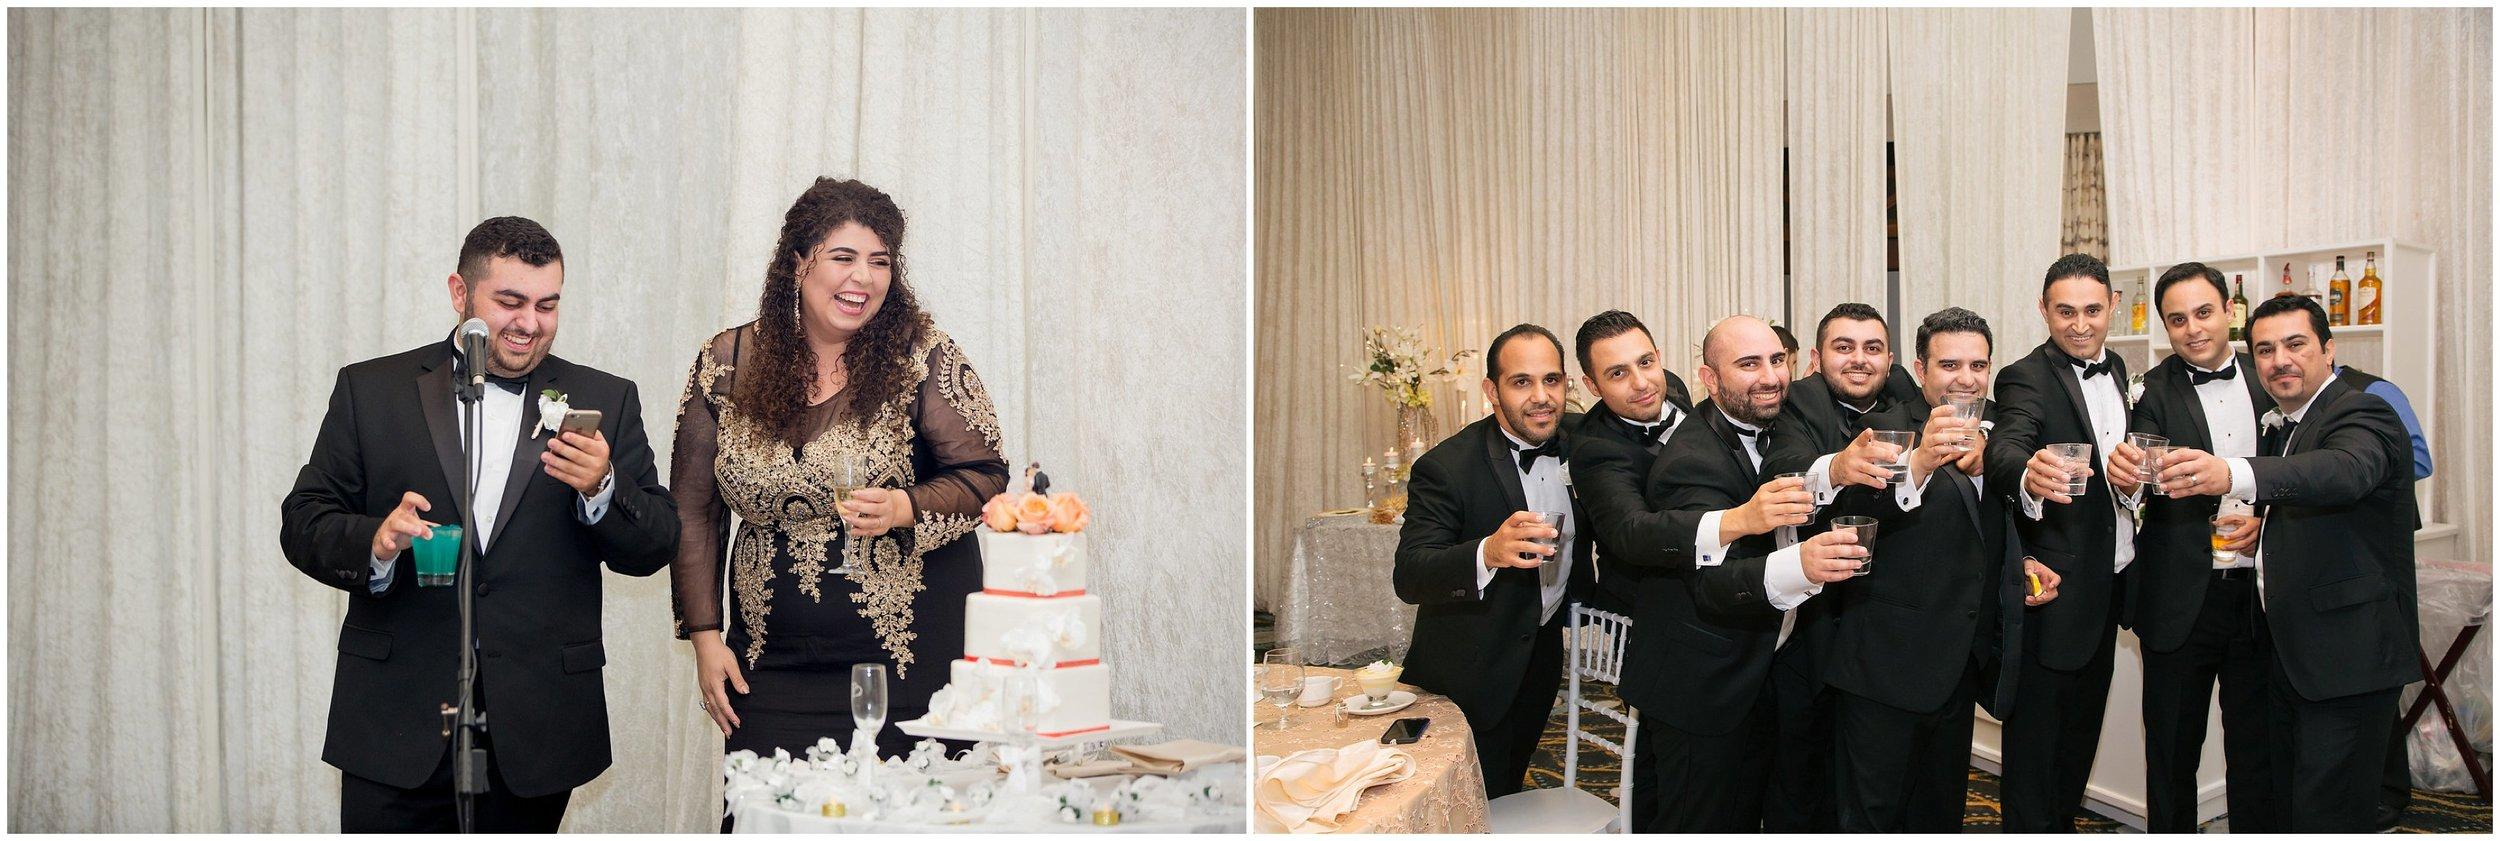 Le Cape Weddings- Destination Wedding Photography -ShayanandNikkie-617-X3_LuxuryDestinationPhotographer.jpg